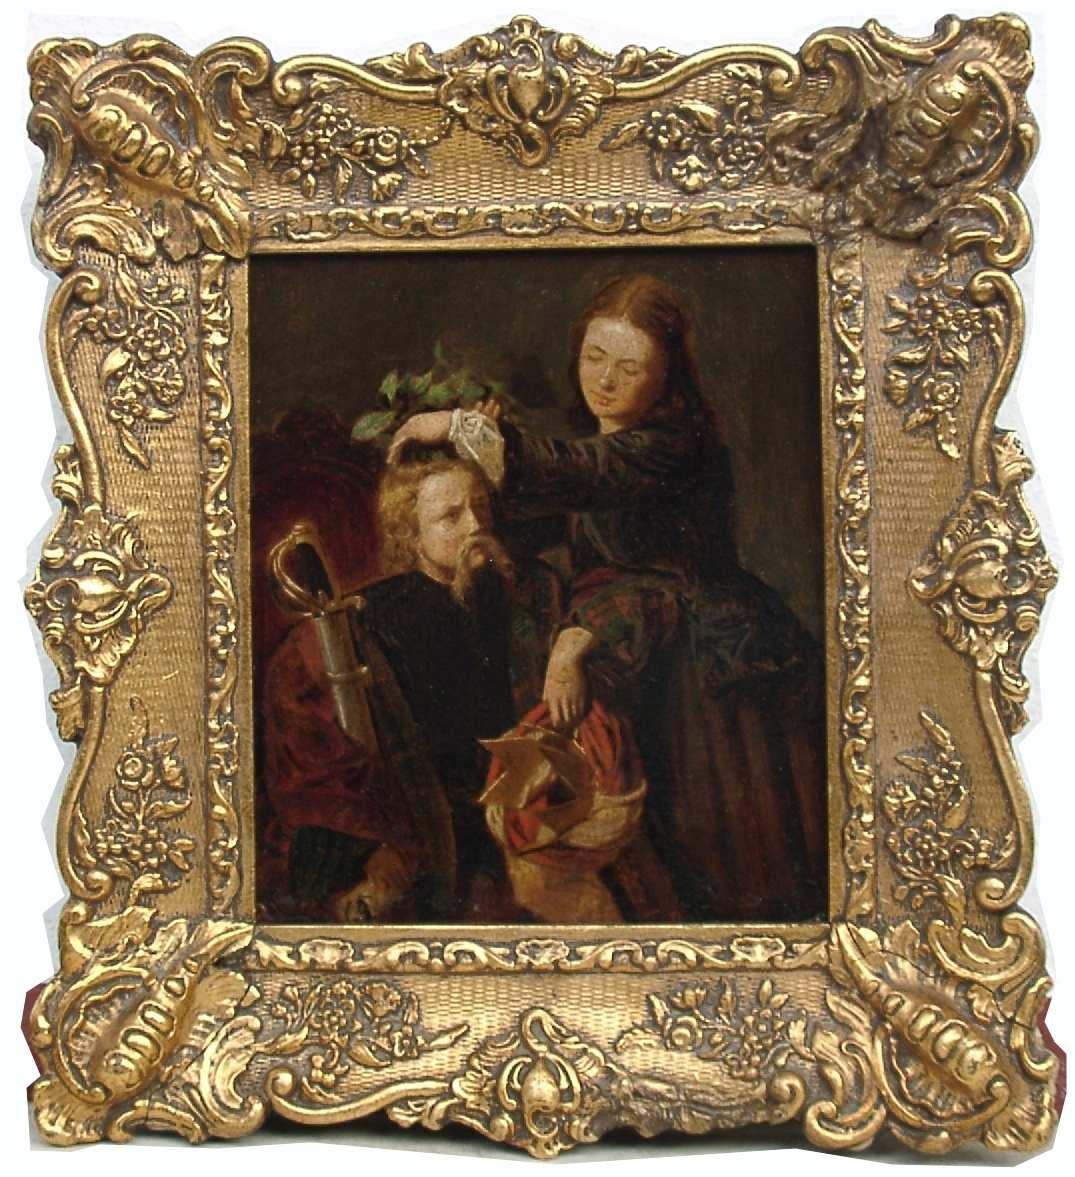 k pper friedrich genre romantik russischer f rst biedermeier painting ebay. Black Bedroom Furniture Sets. Home Design Ideas